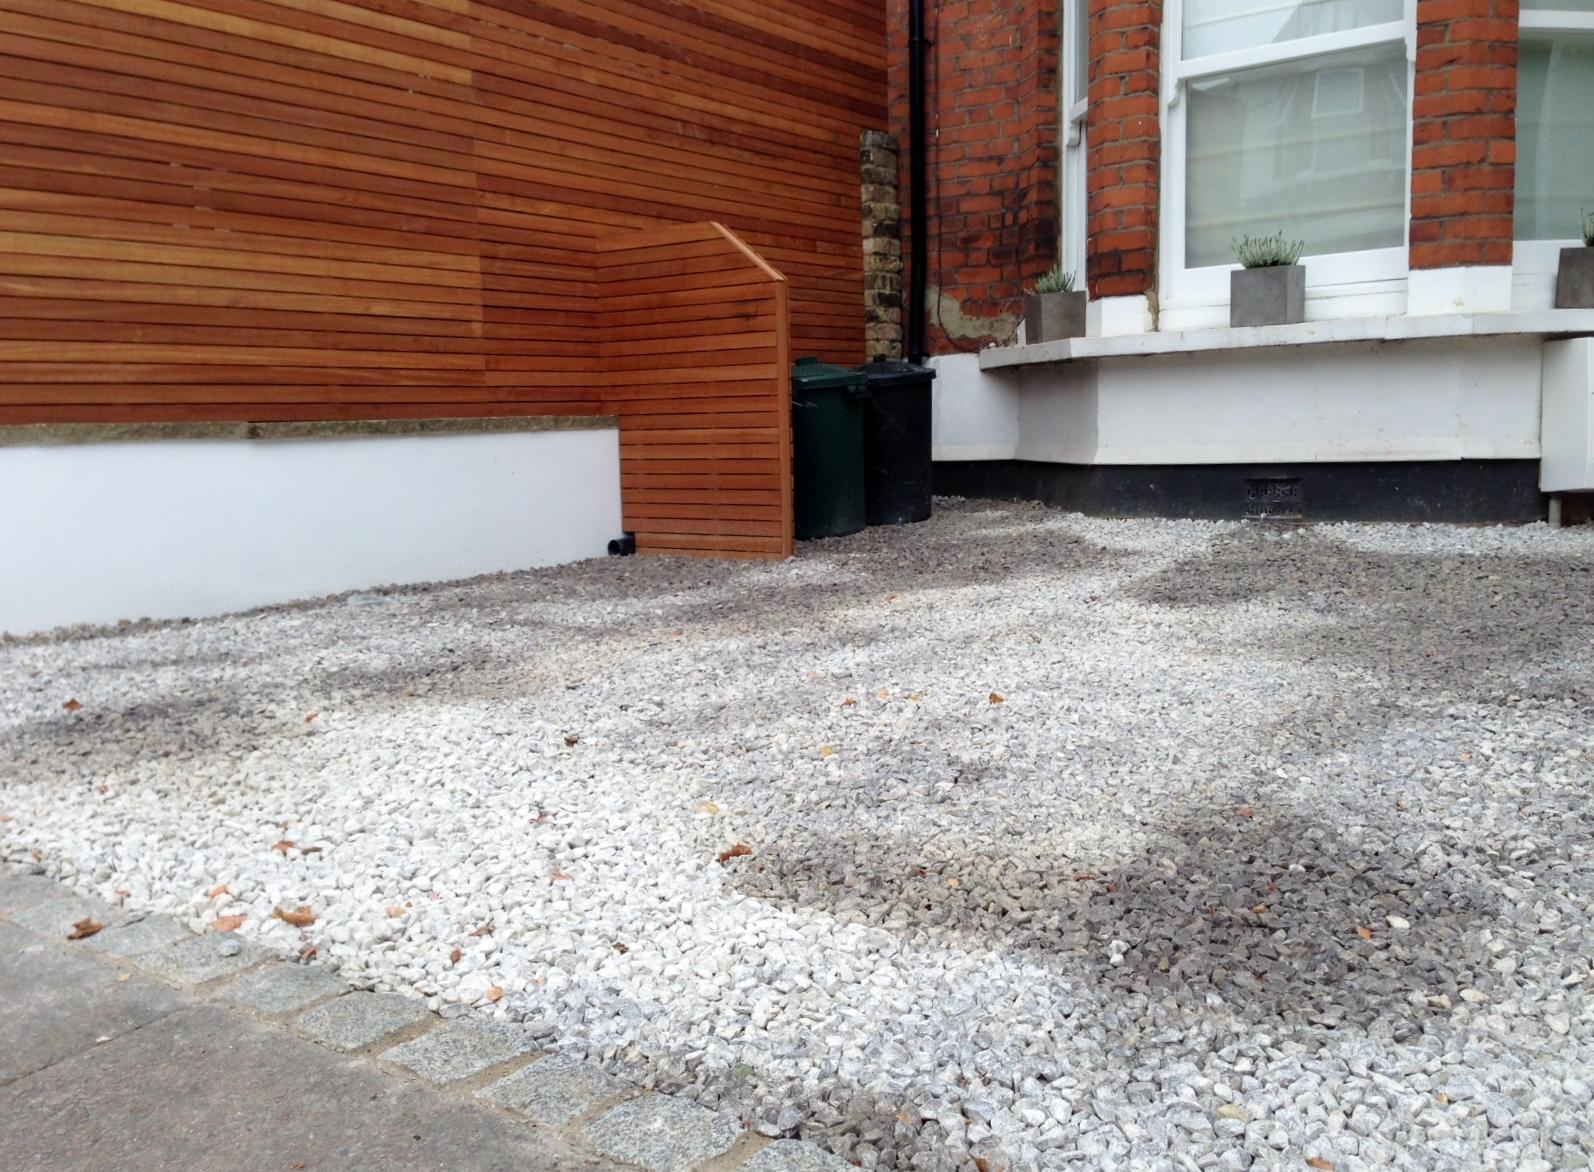 front garden drivewat gravel travertine paving path hardwood privacy screen trellis tooting london (14)